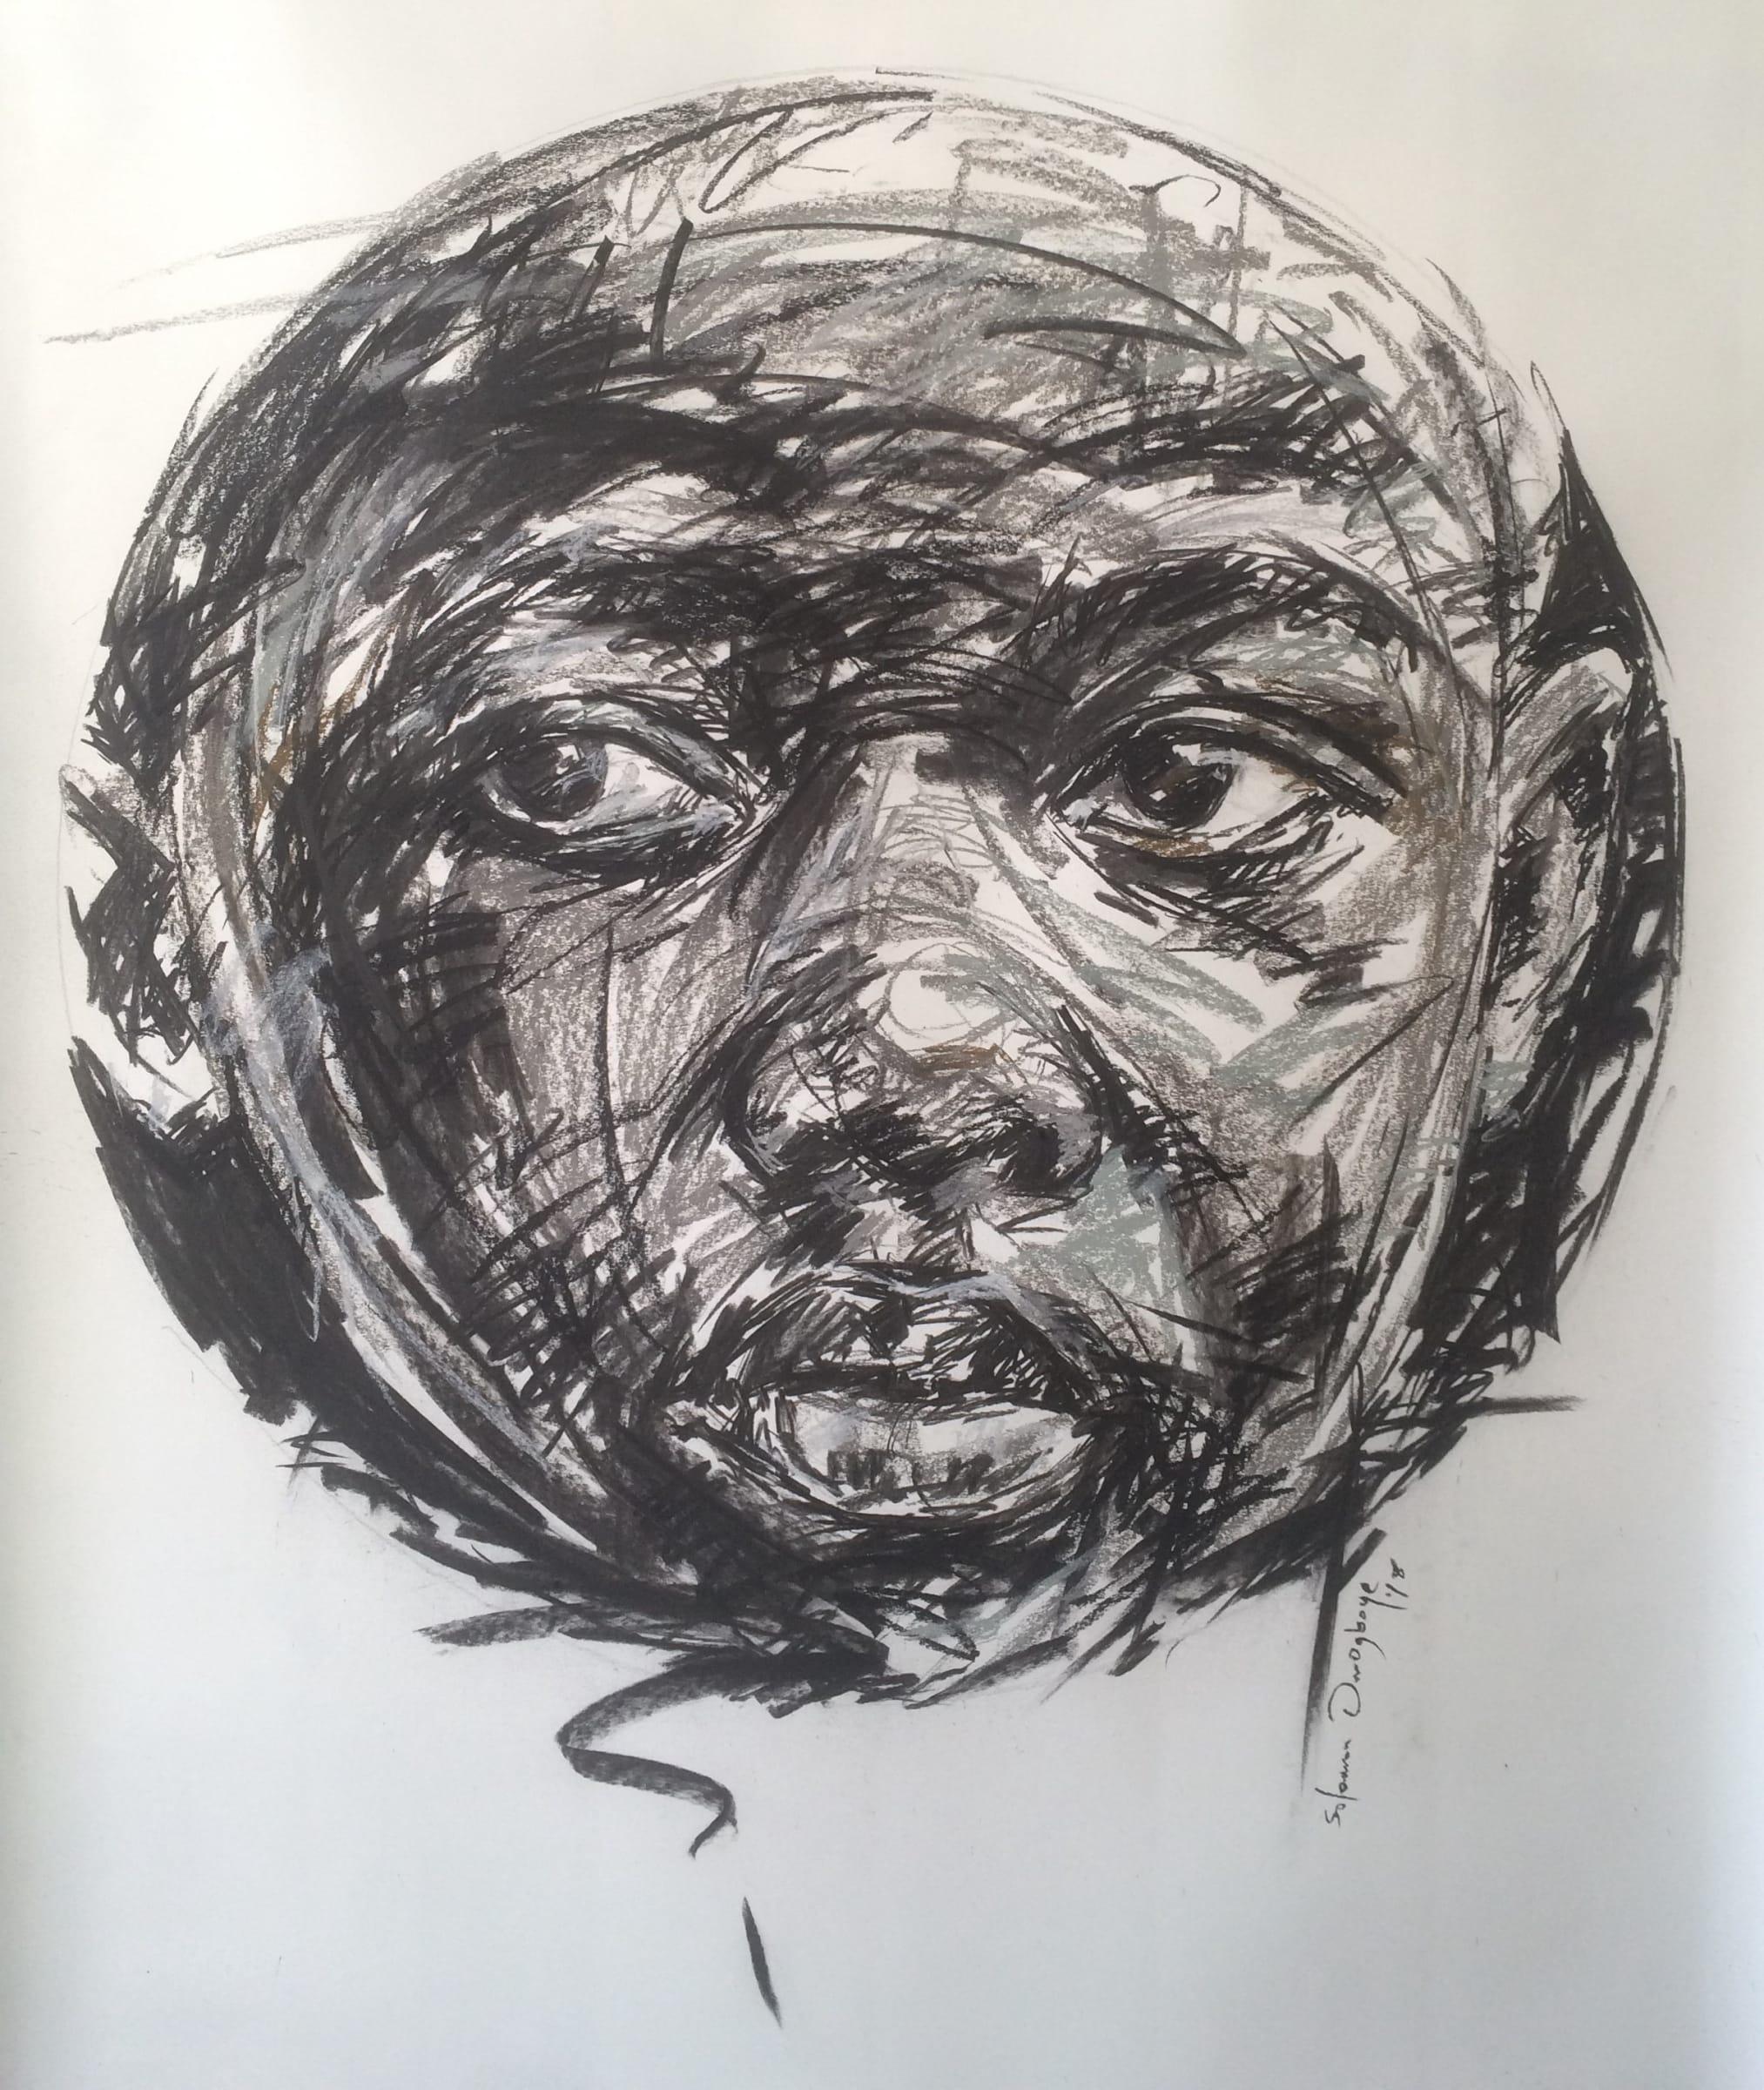 <span class=&#34;link fancybox-details-link&#34;><a href=&#34;/artists/39-solomon-omogboye/works/2021-solomon-omogboye-dear-innocence-2018/&#34;>View Detail Page</a></span><div class=&#34;artist&#34;><strong>Solomon Omogboye</strong></div> <div class=&#34;title&#34;><em>Dear Innocence</em>, 2018</div> <div class=&#34;medium&#34;>Drawing On Paper</div> <div class=&#34;dimensions&#34;>99cm x 129cm (118.7cm x 148.7cm framed)</div>